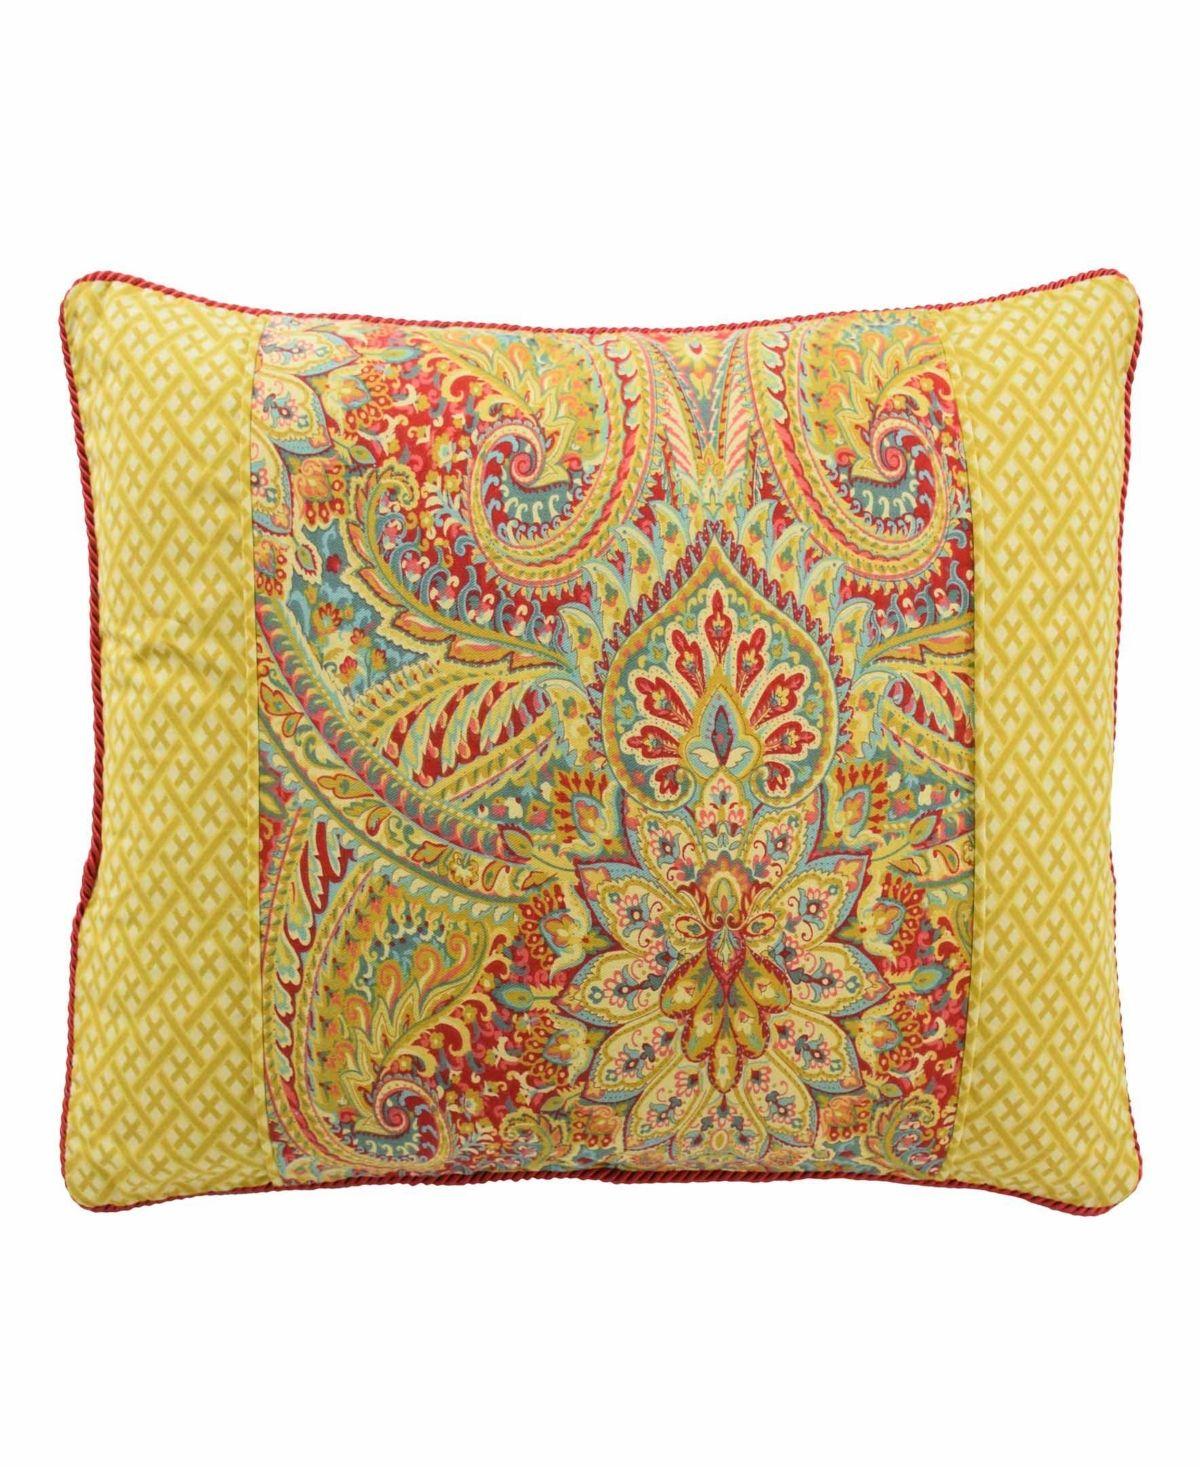 Waverly Swept Away Reversible Oblong Decorative Pillow Reviews Decorative Throw Pillows Bed Bath Macy S